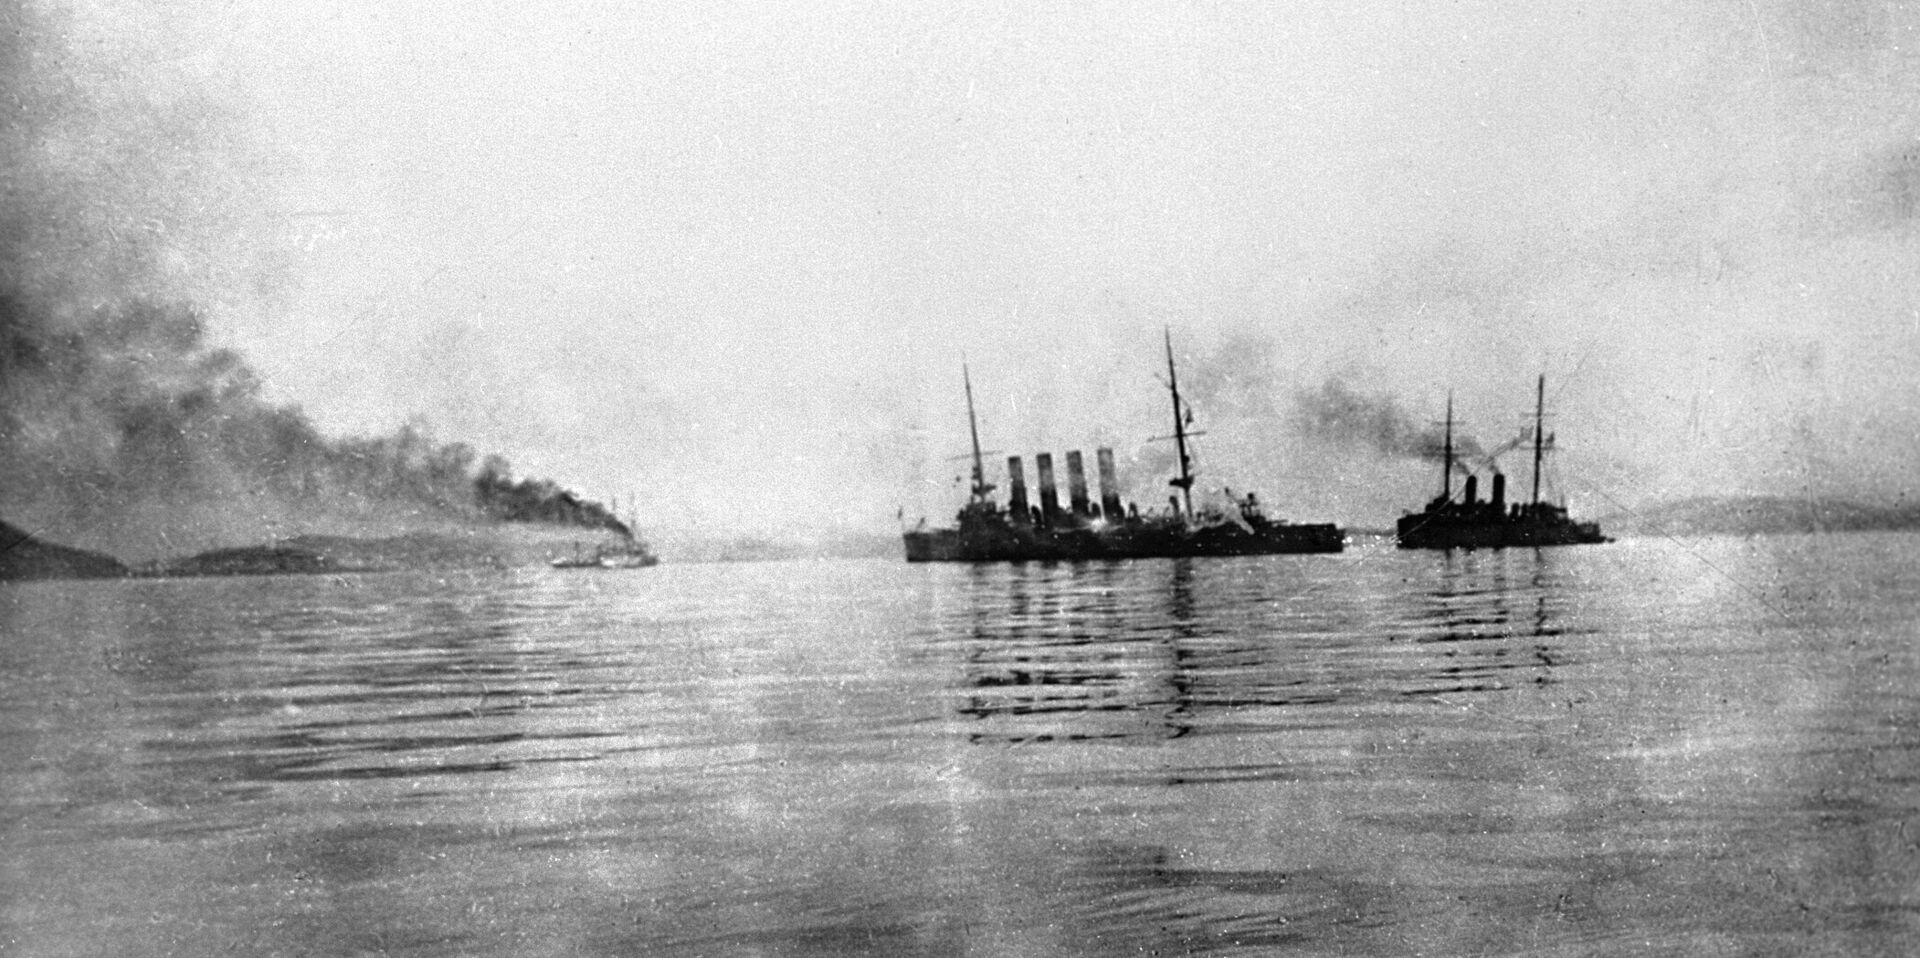 Buques rusos Variag y Koreets, tras la batalla de Chemulpo - Sputnik Mundo, 1920, 11.02.2021